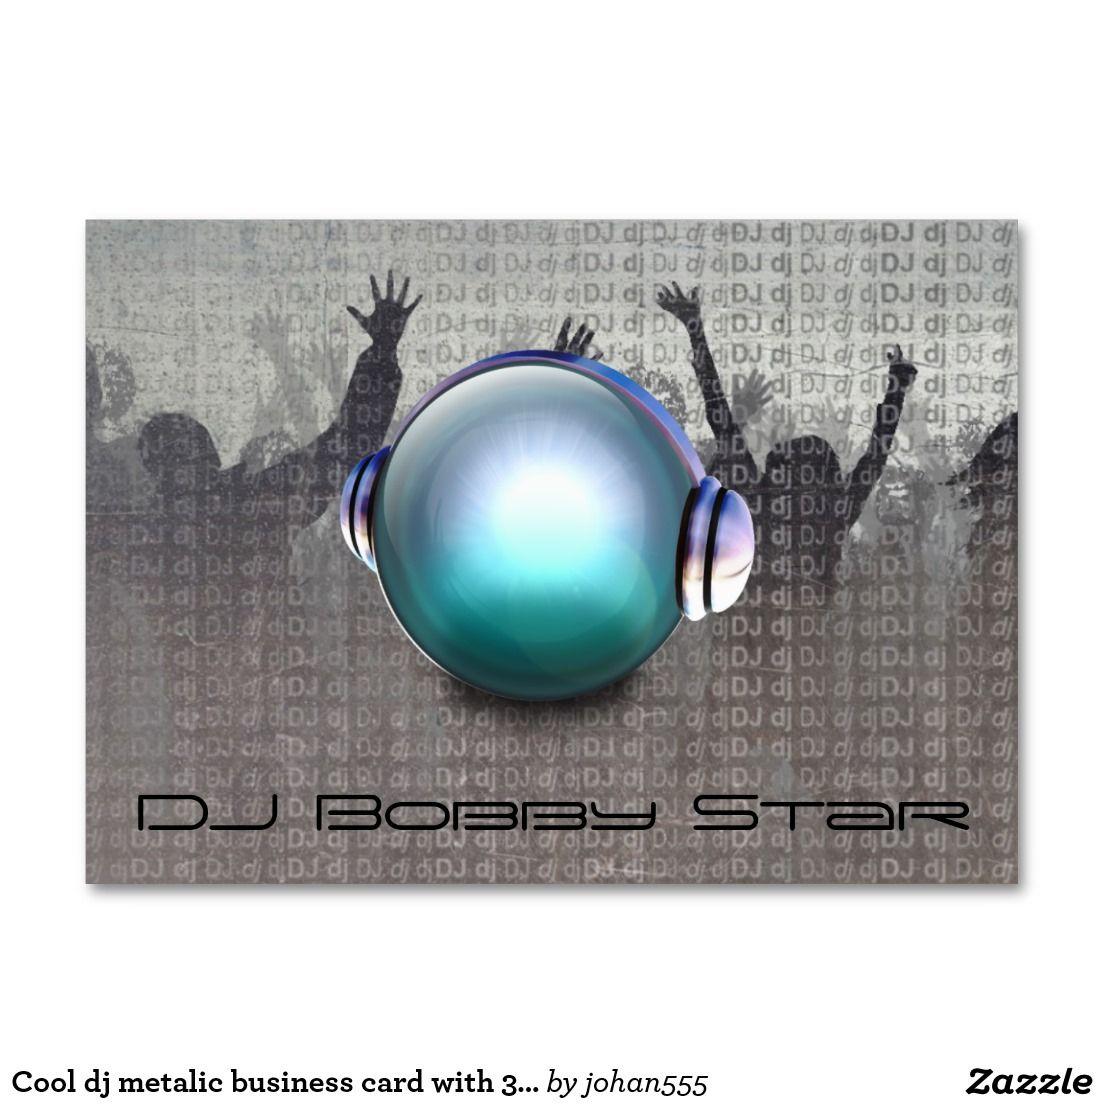 Cool dj metalic business card with 3D DJ logo. | DJ/Music Business ...